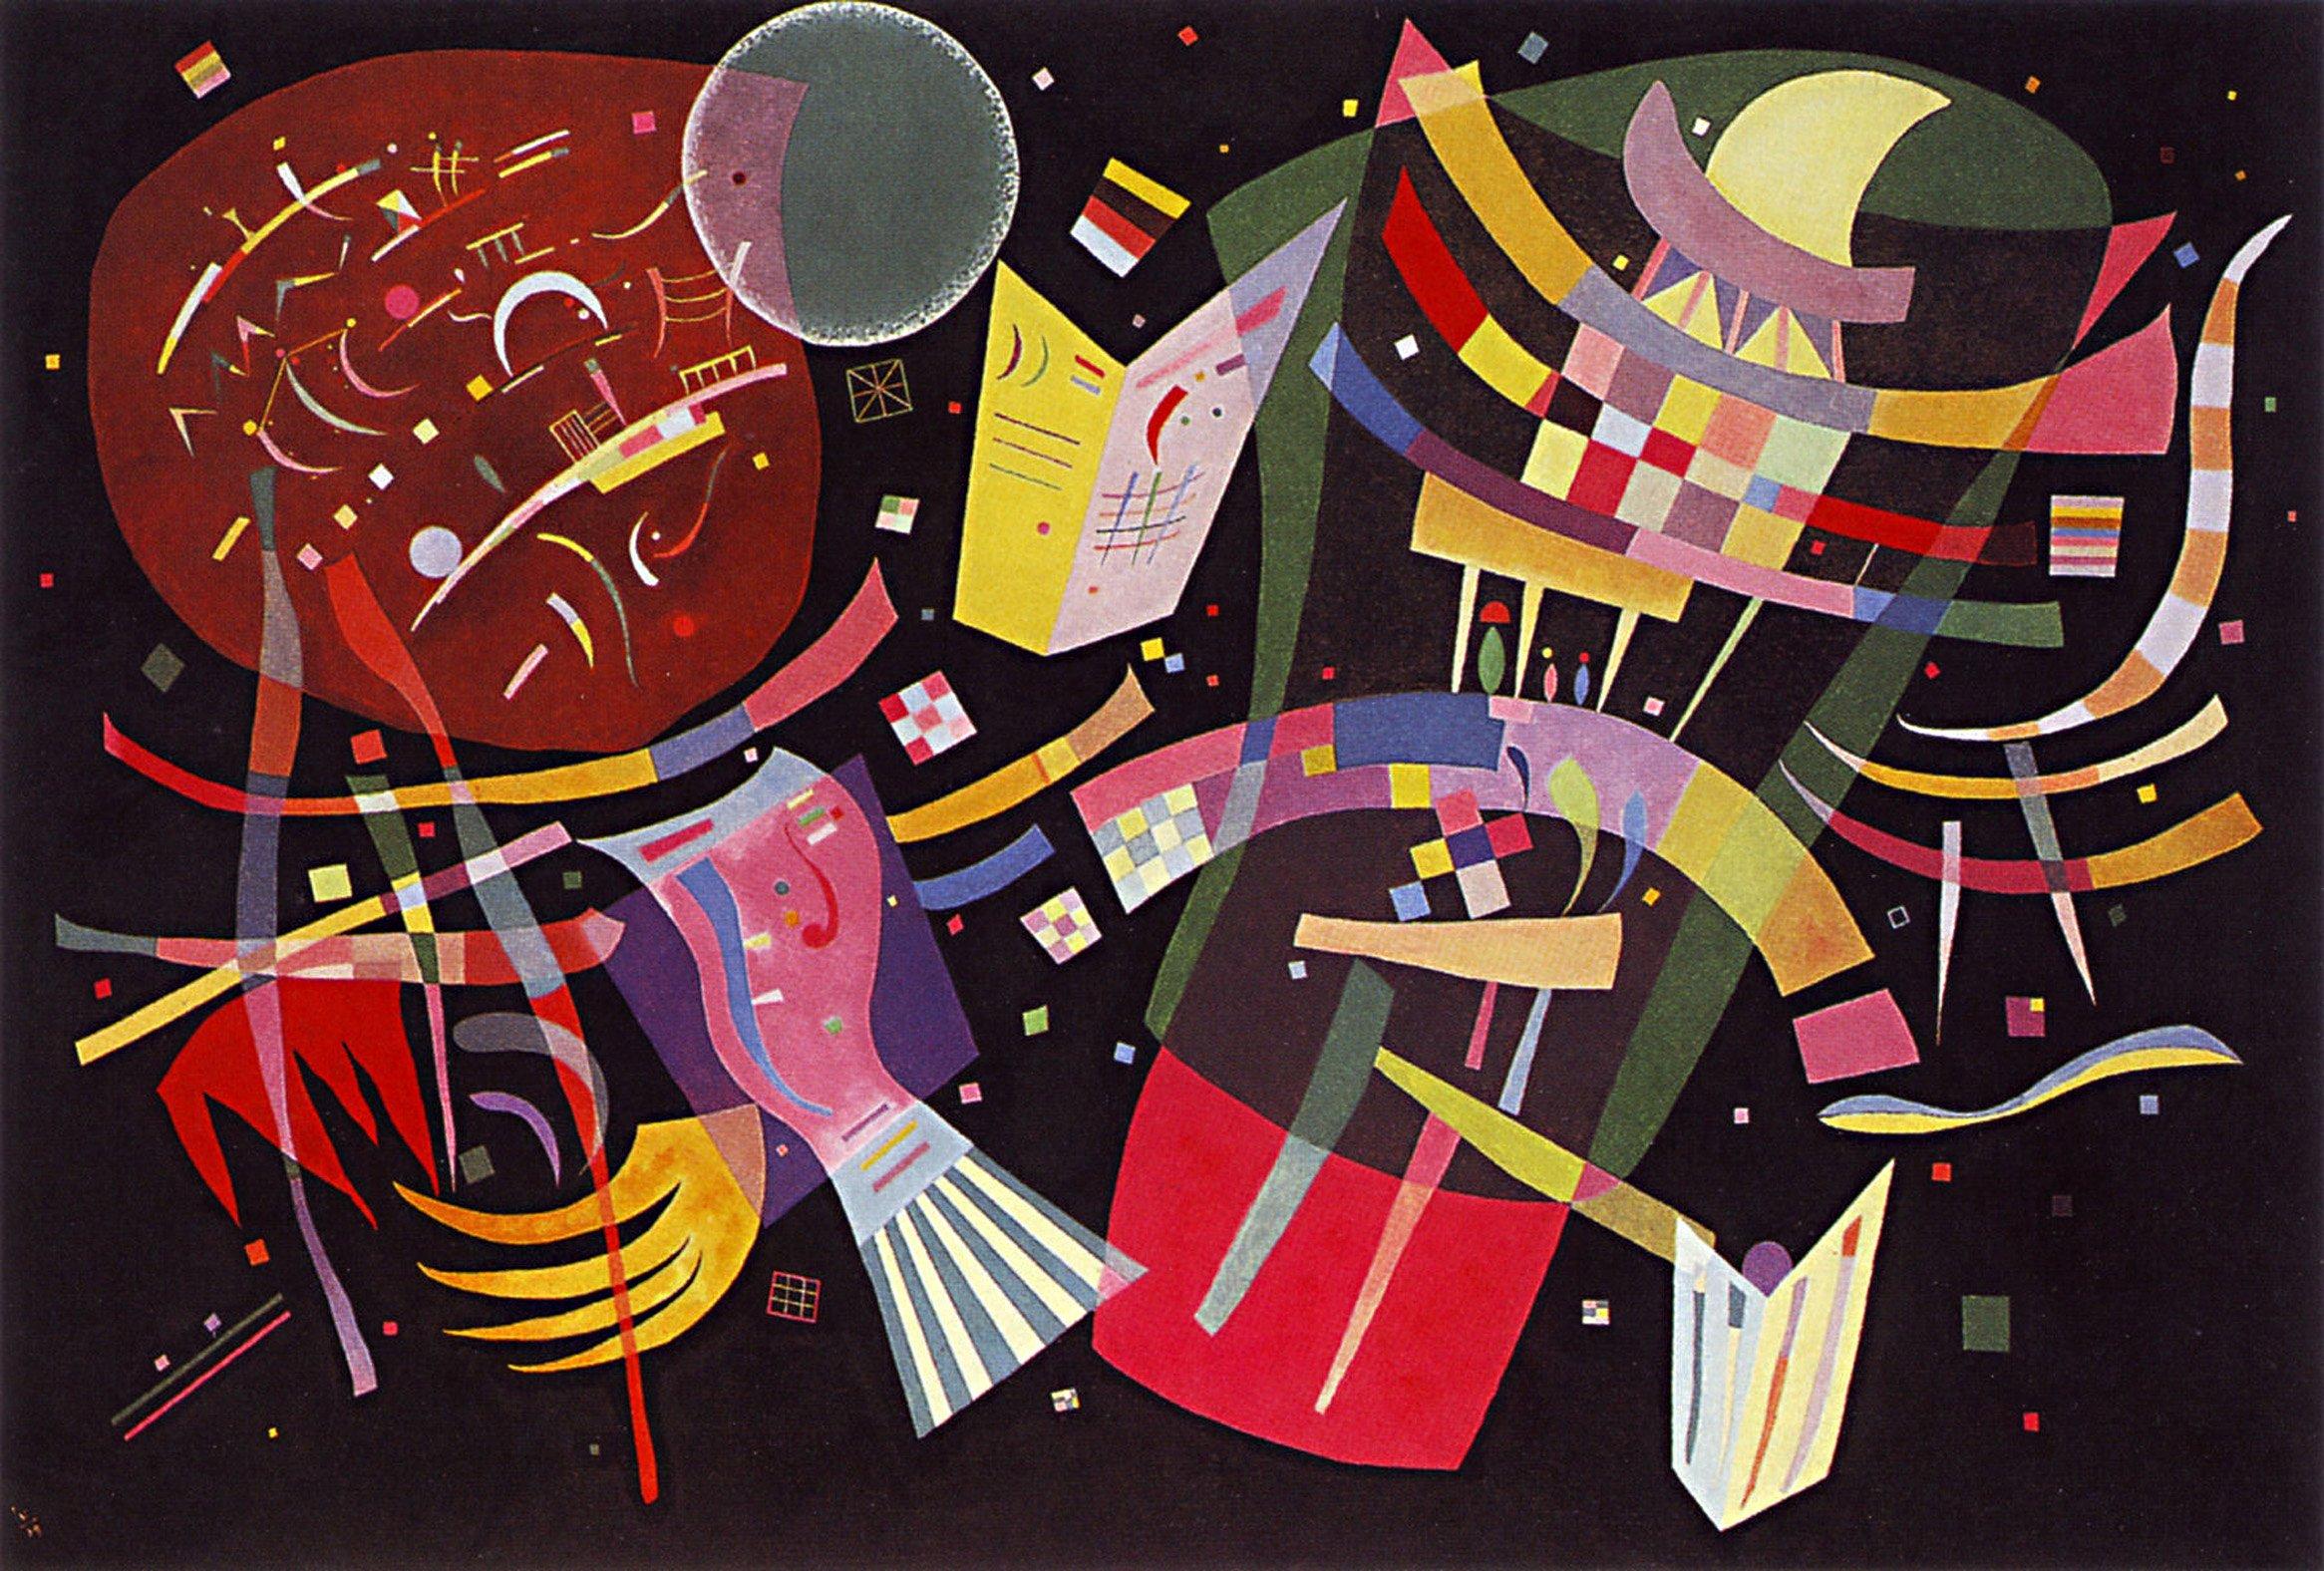 Legendarte P-283 Vassily Kandinsky, Tela e Legno, Multicolore, 60x90x4 cm